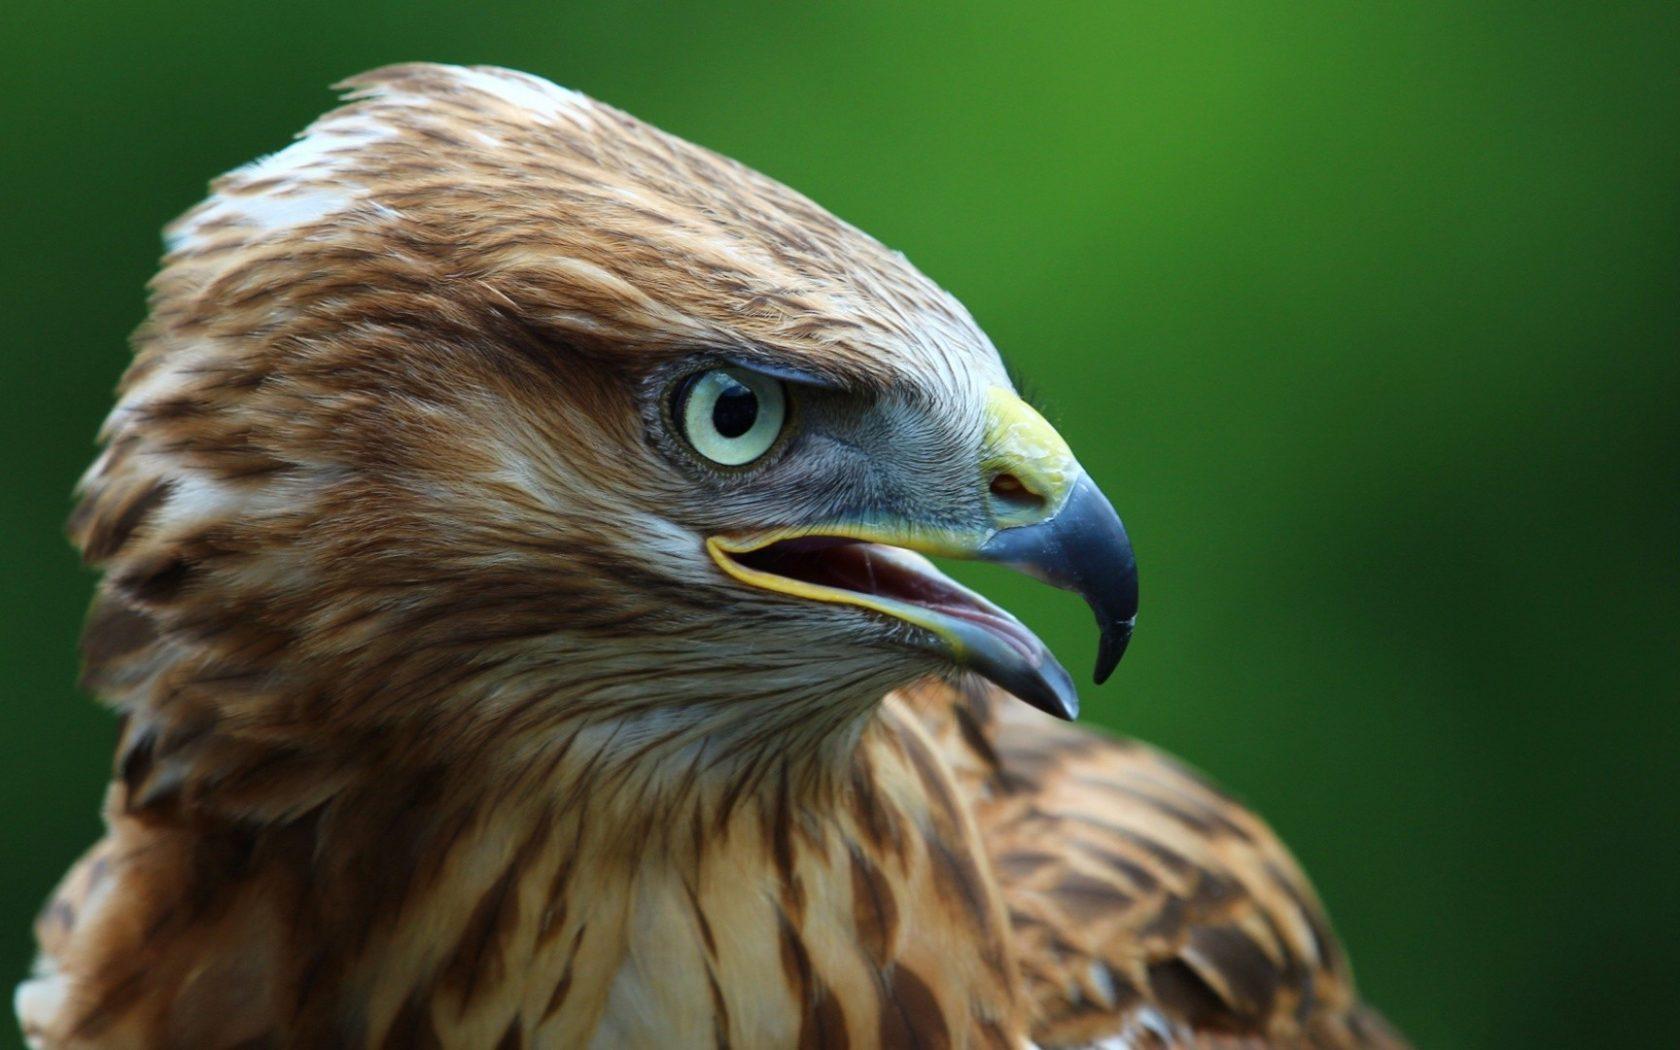 Green Eyes Eagle Wallpaper Background | HD Wallpaper ...